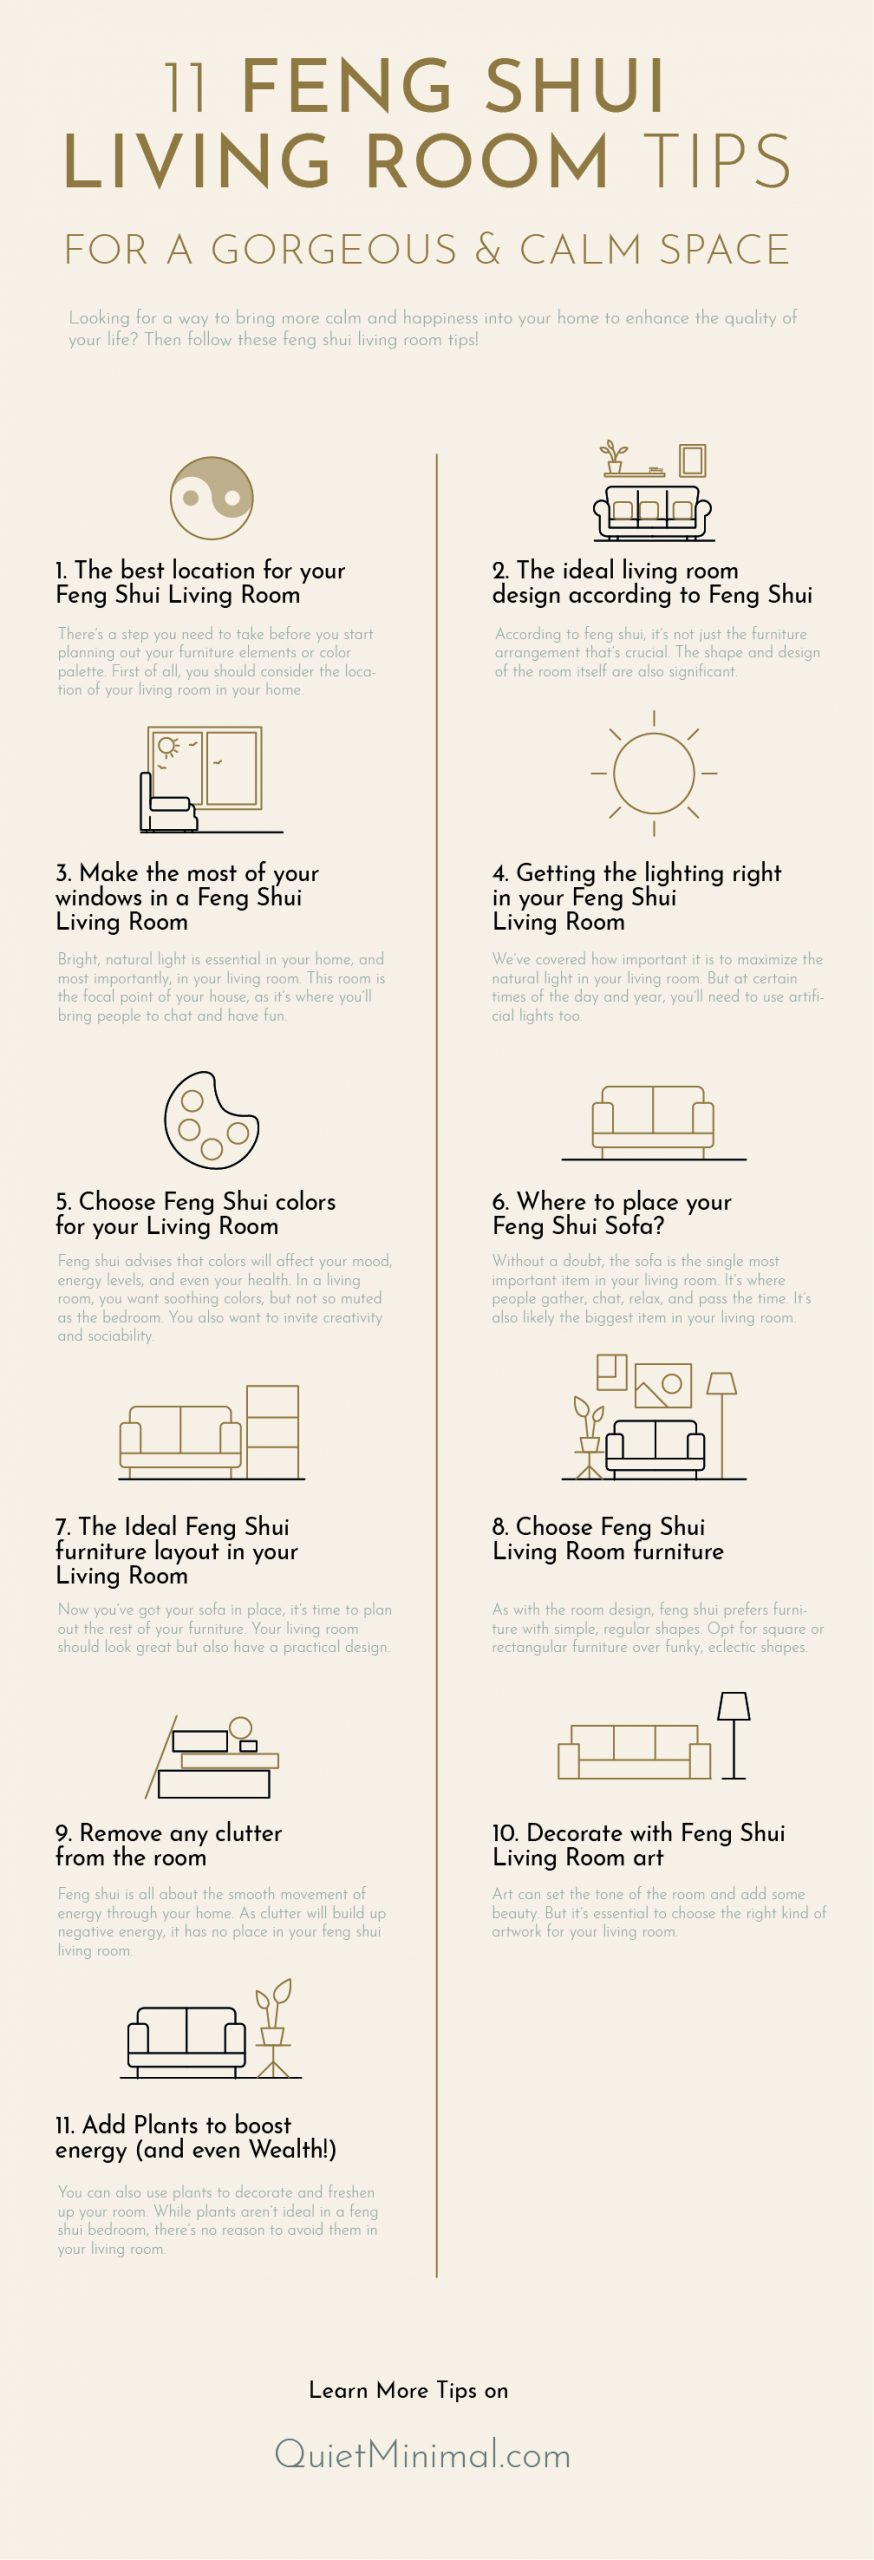 11 Feng Shui Living Room Tips For A, Feng Shui Living Room